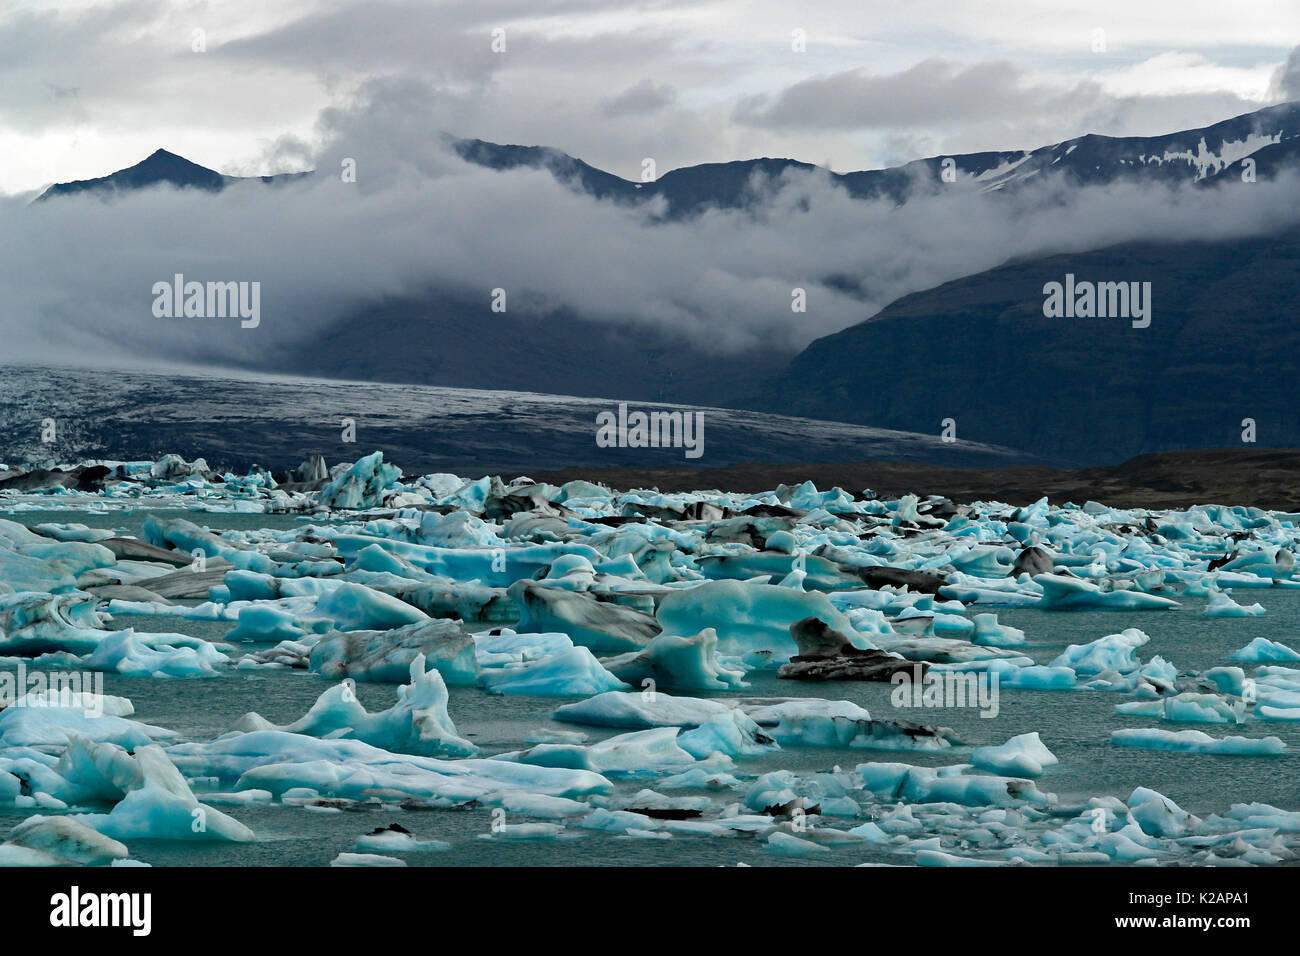 Floating icebergs in the glacial lake Jokulsarlon - Iceland - Stock Image